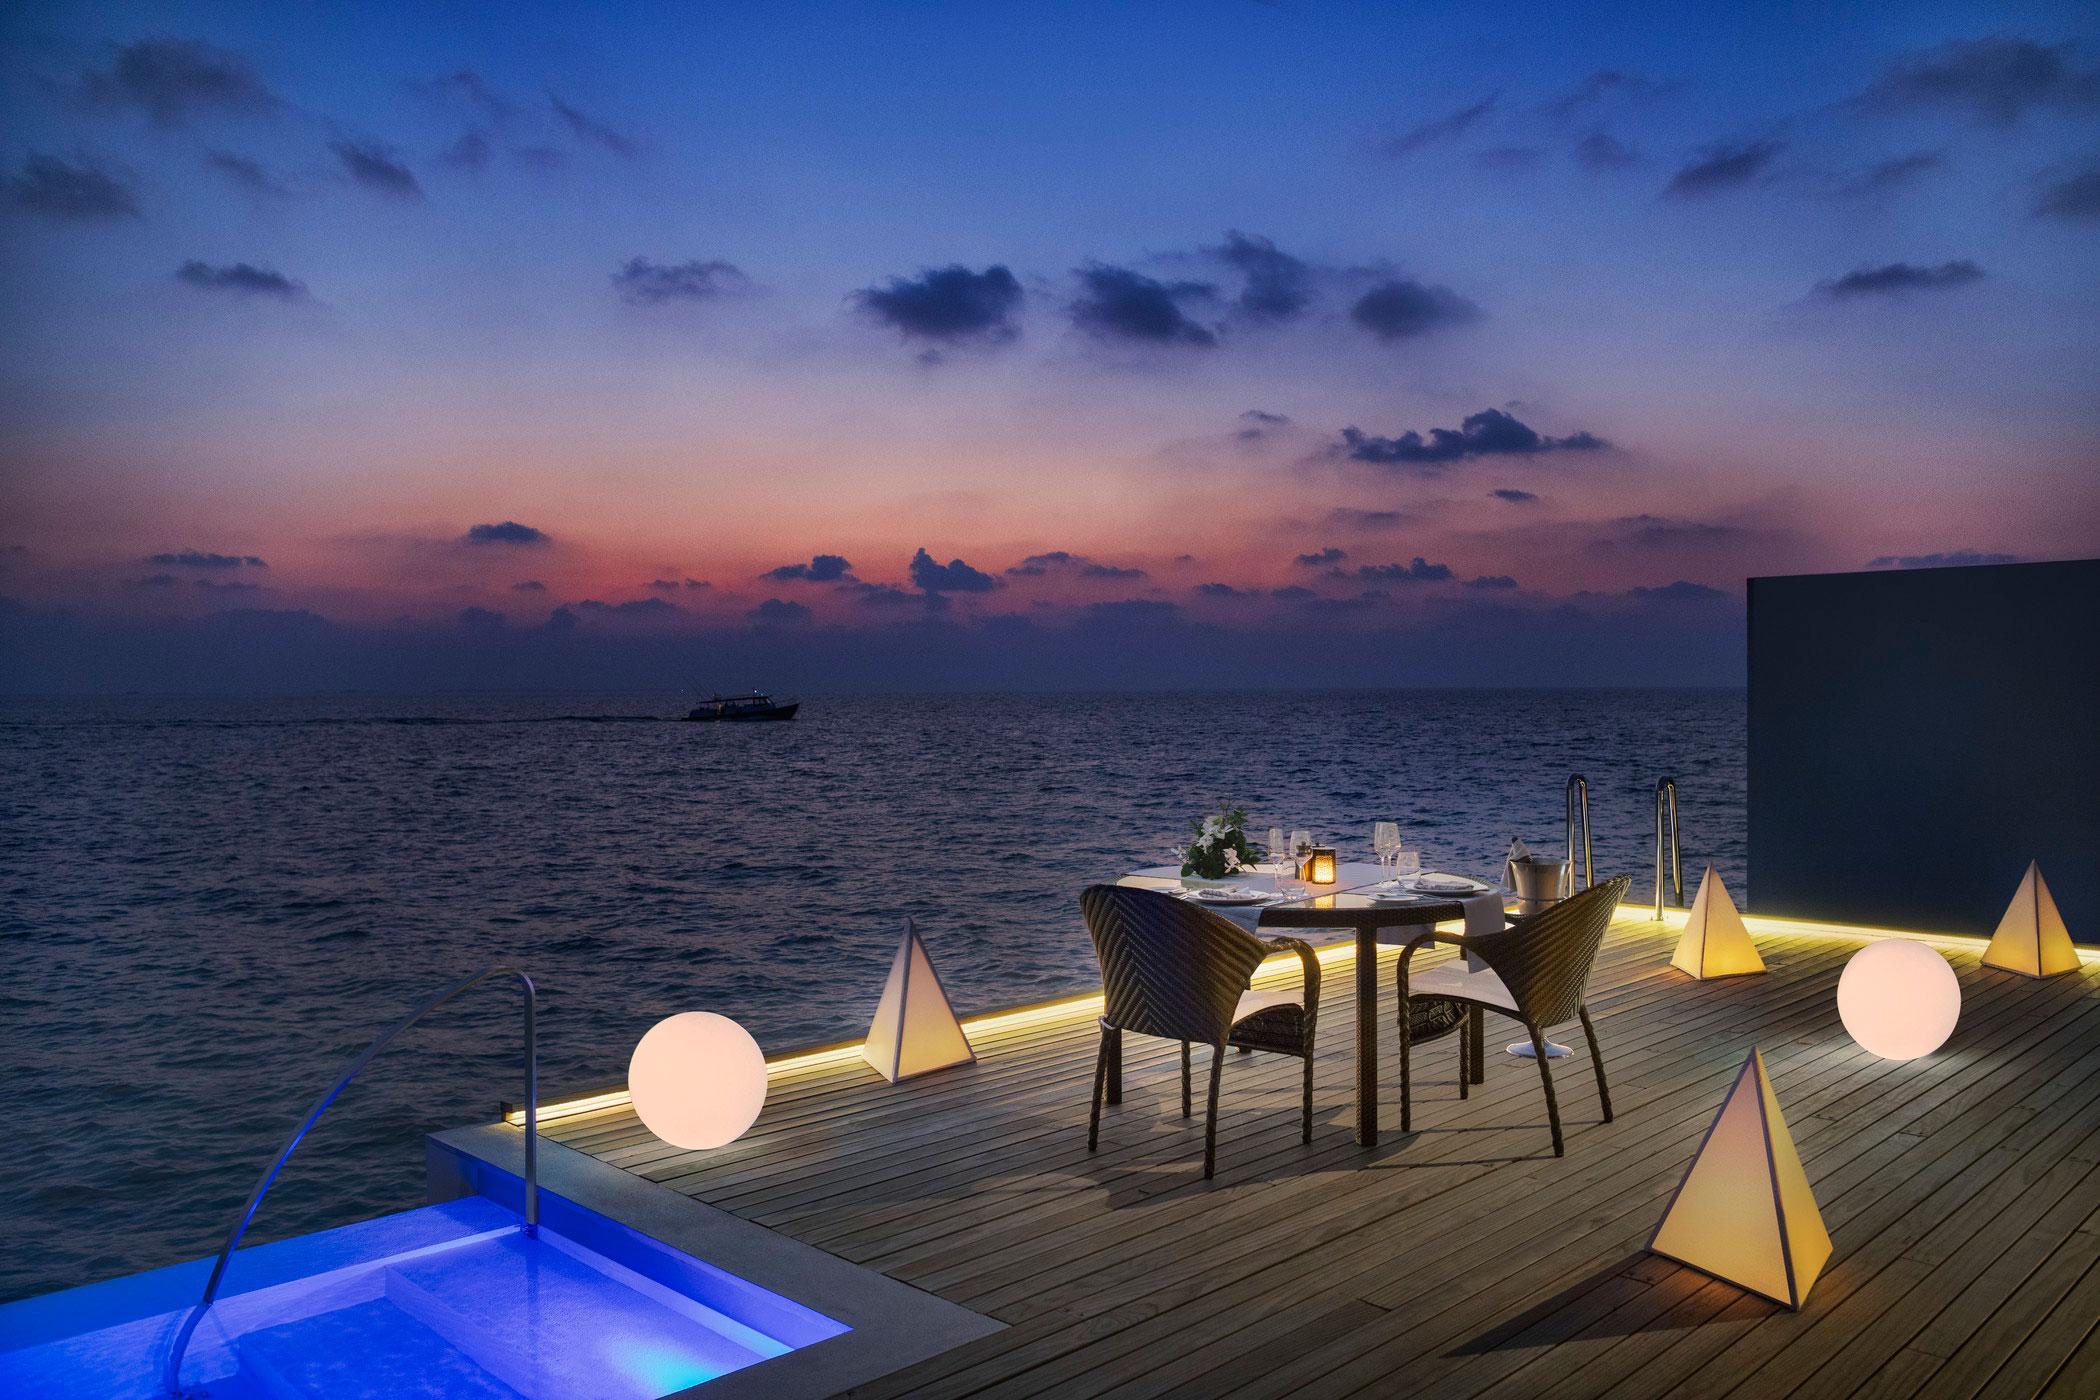 wesMLEWIed-274096-In-villa-Dining-Med